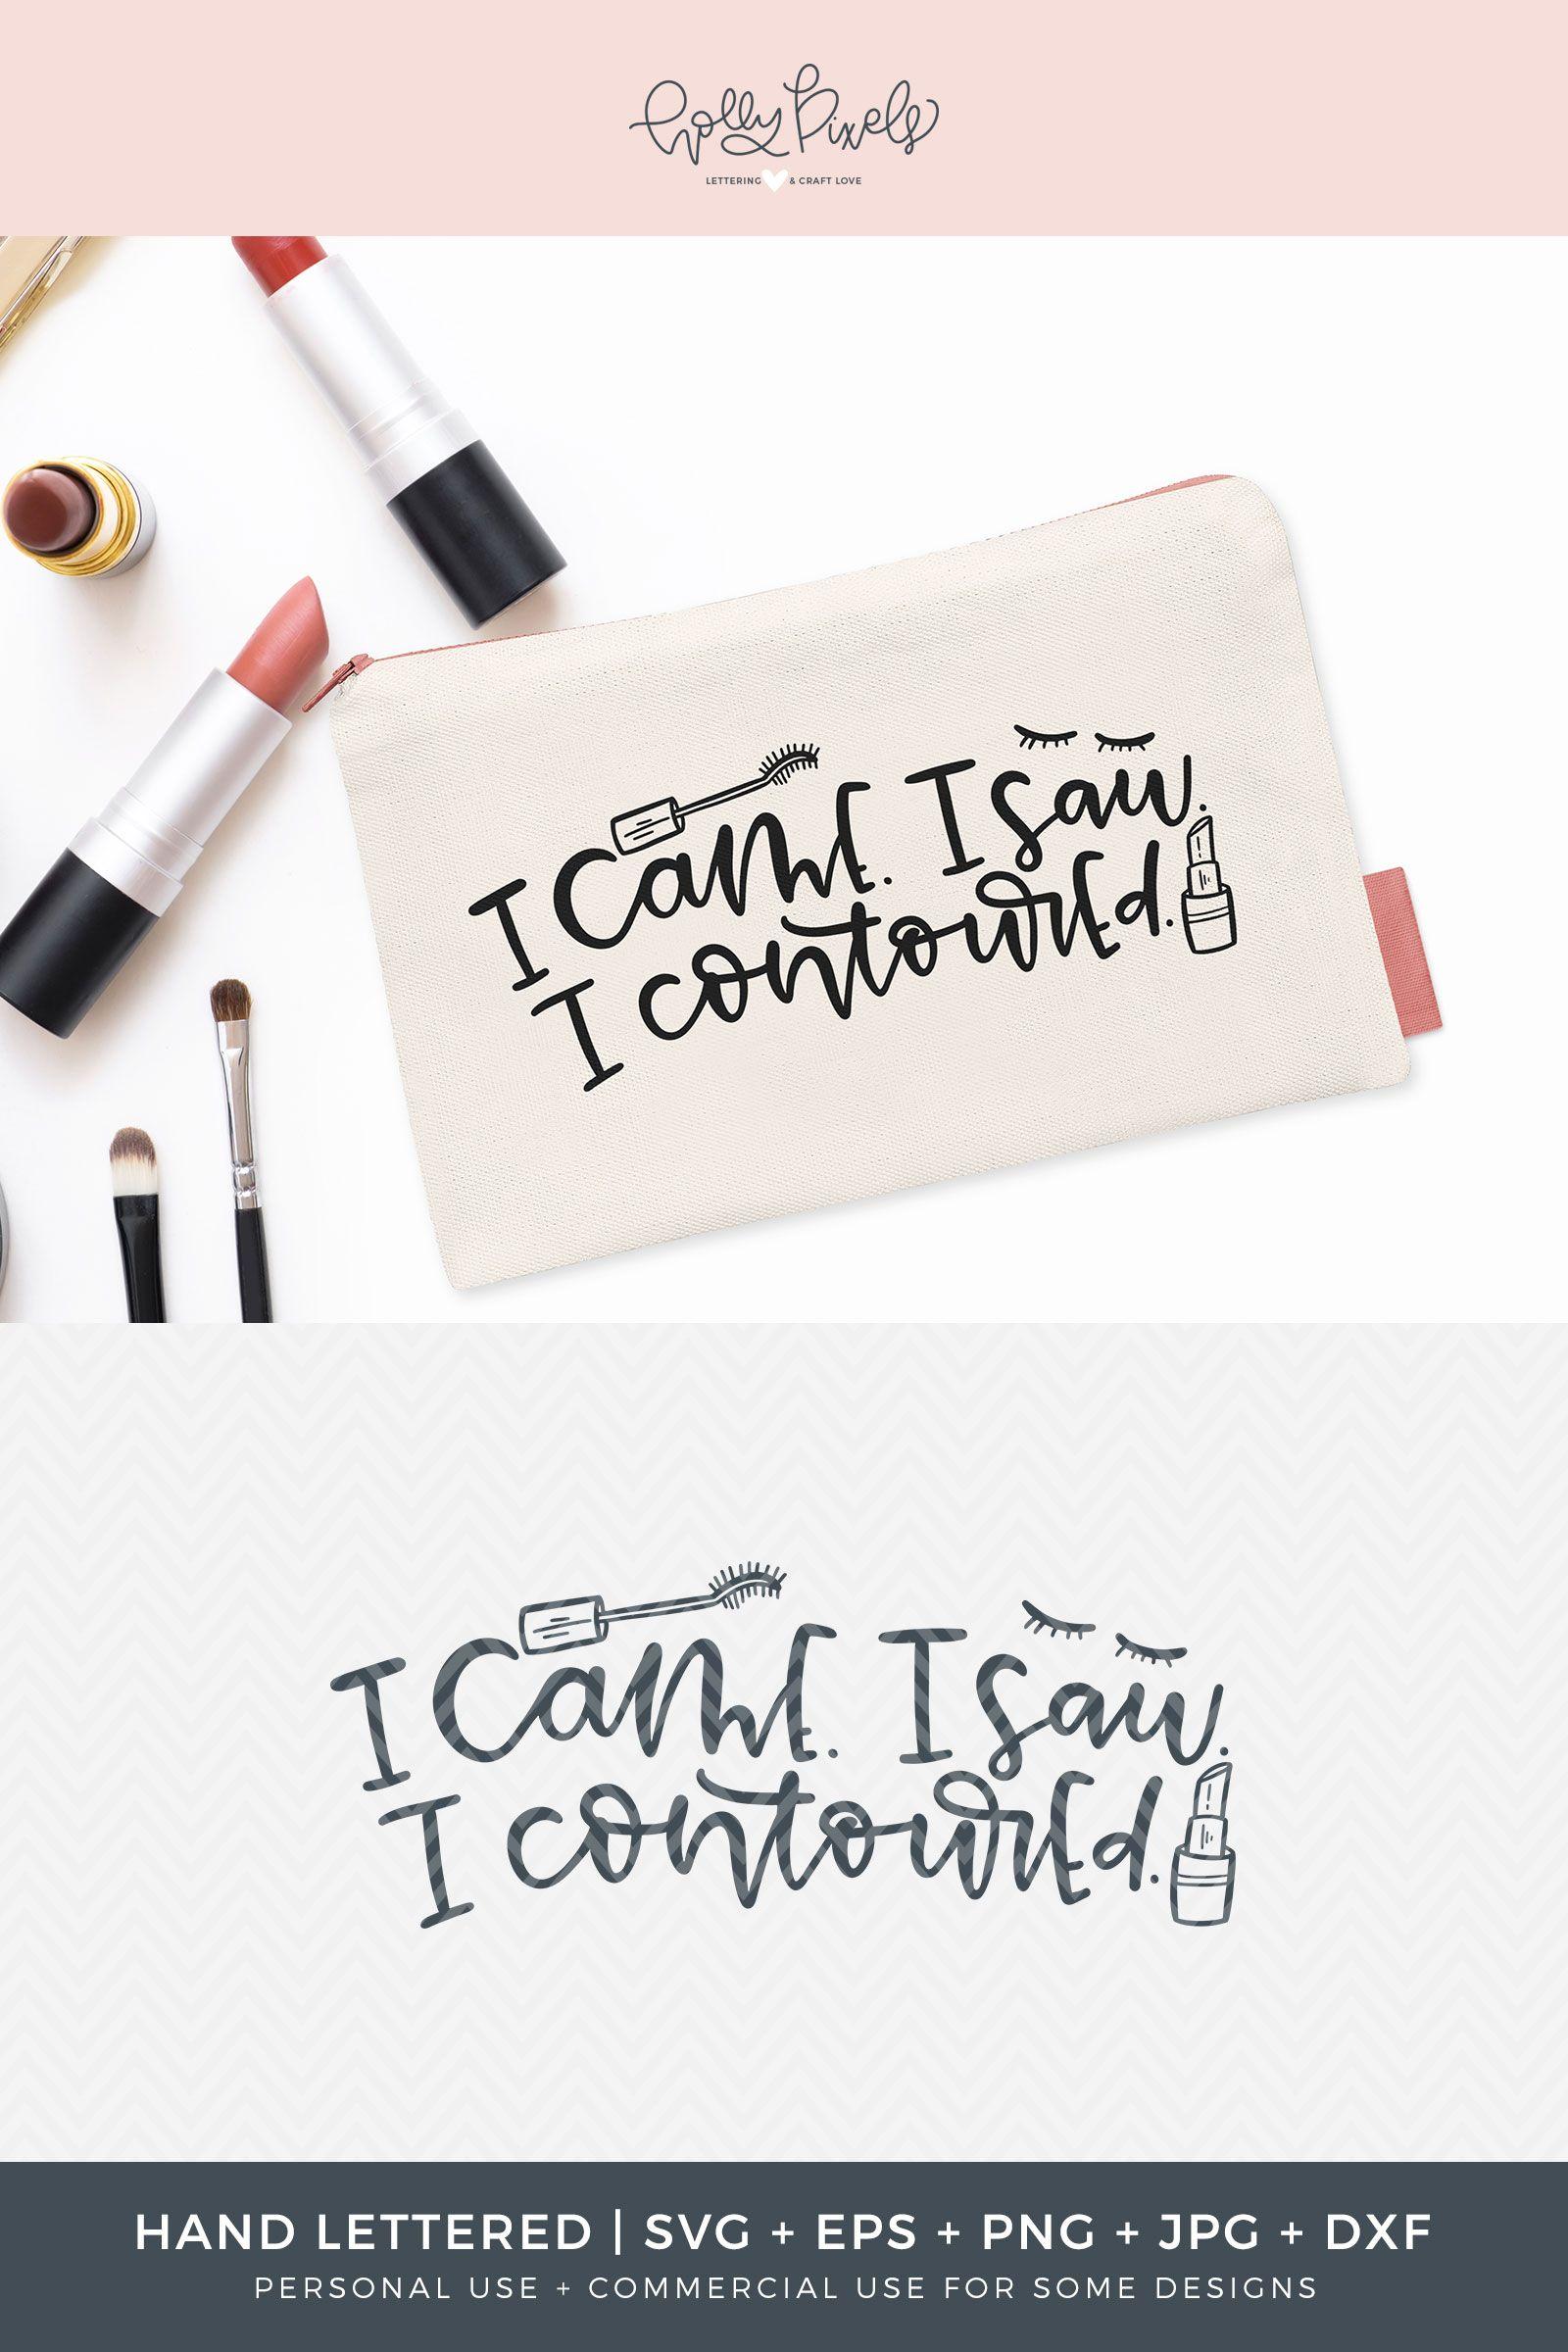 Cute makeup bag SVG File I came I saw I contoured by